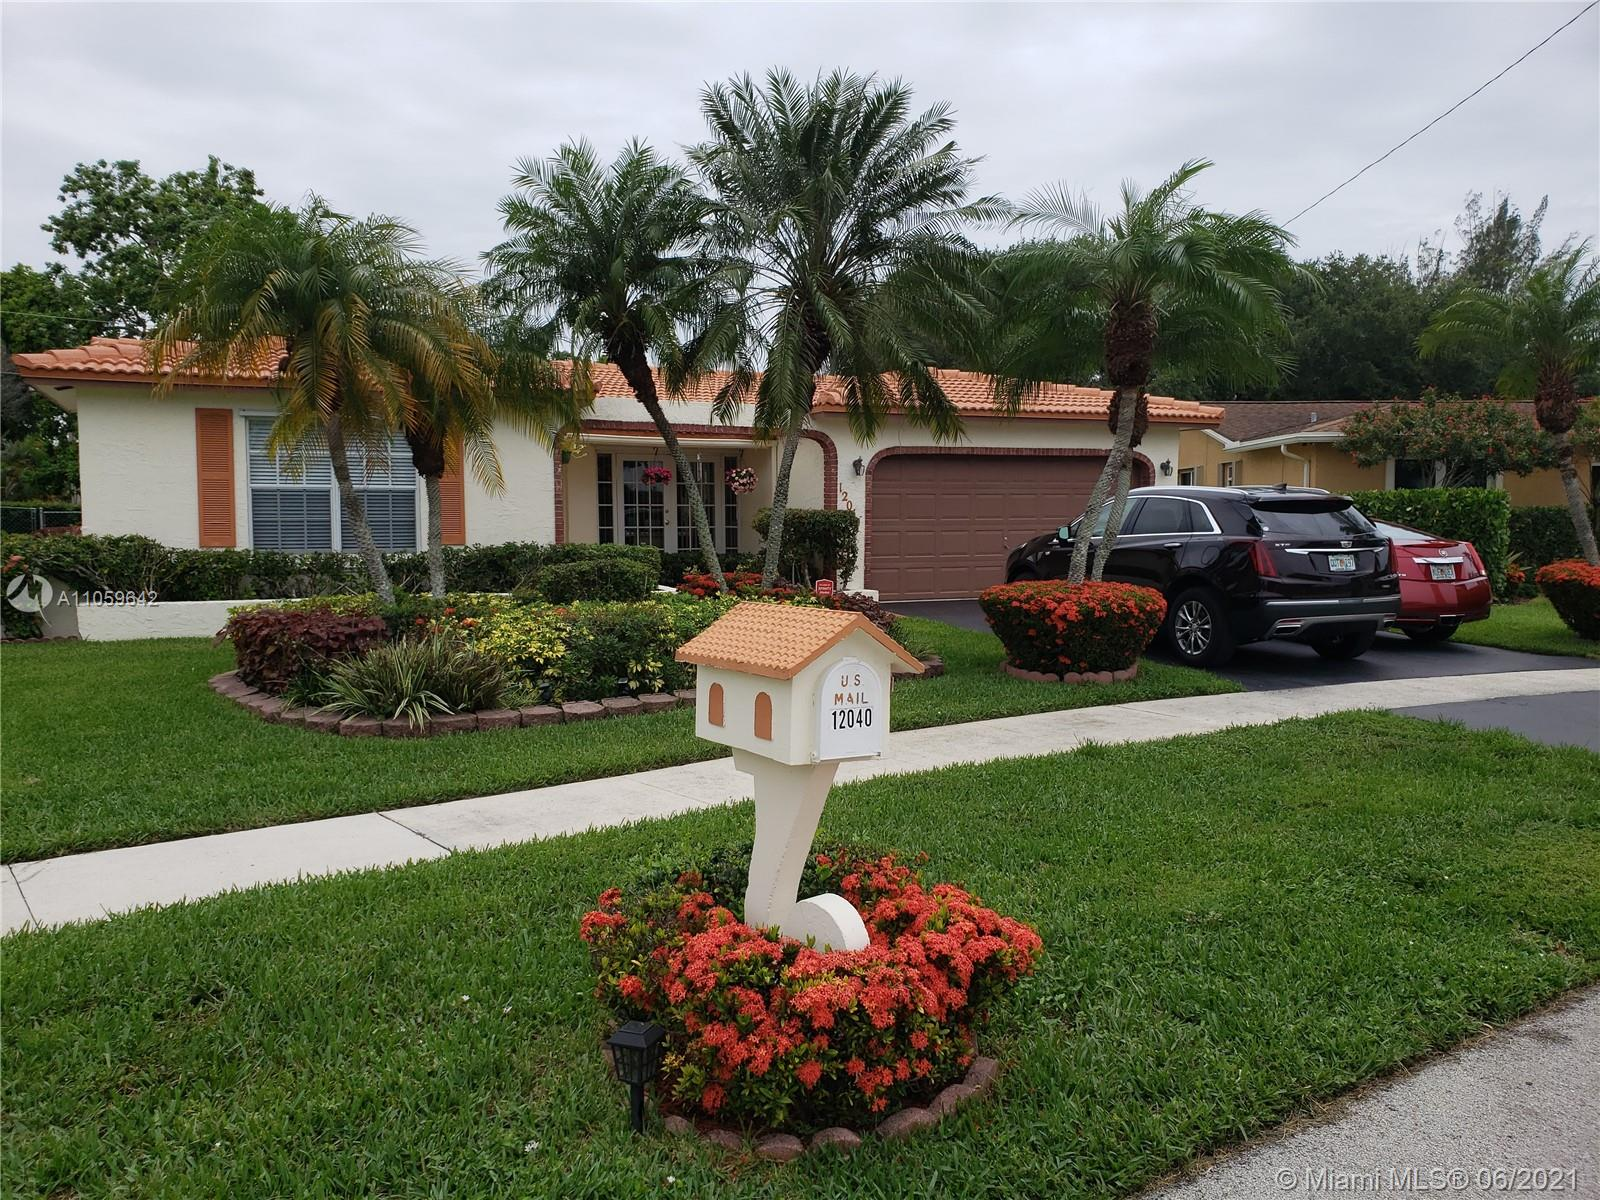 Sunrise Golf Village - 12040 NW 29th St, Sunrise, FL 33323